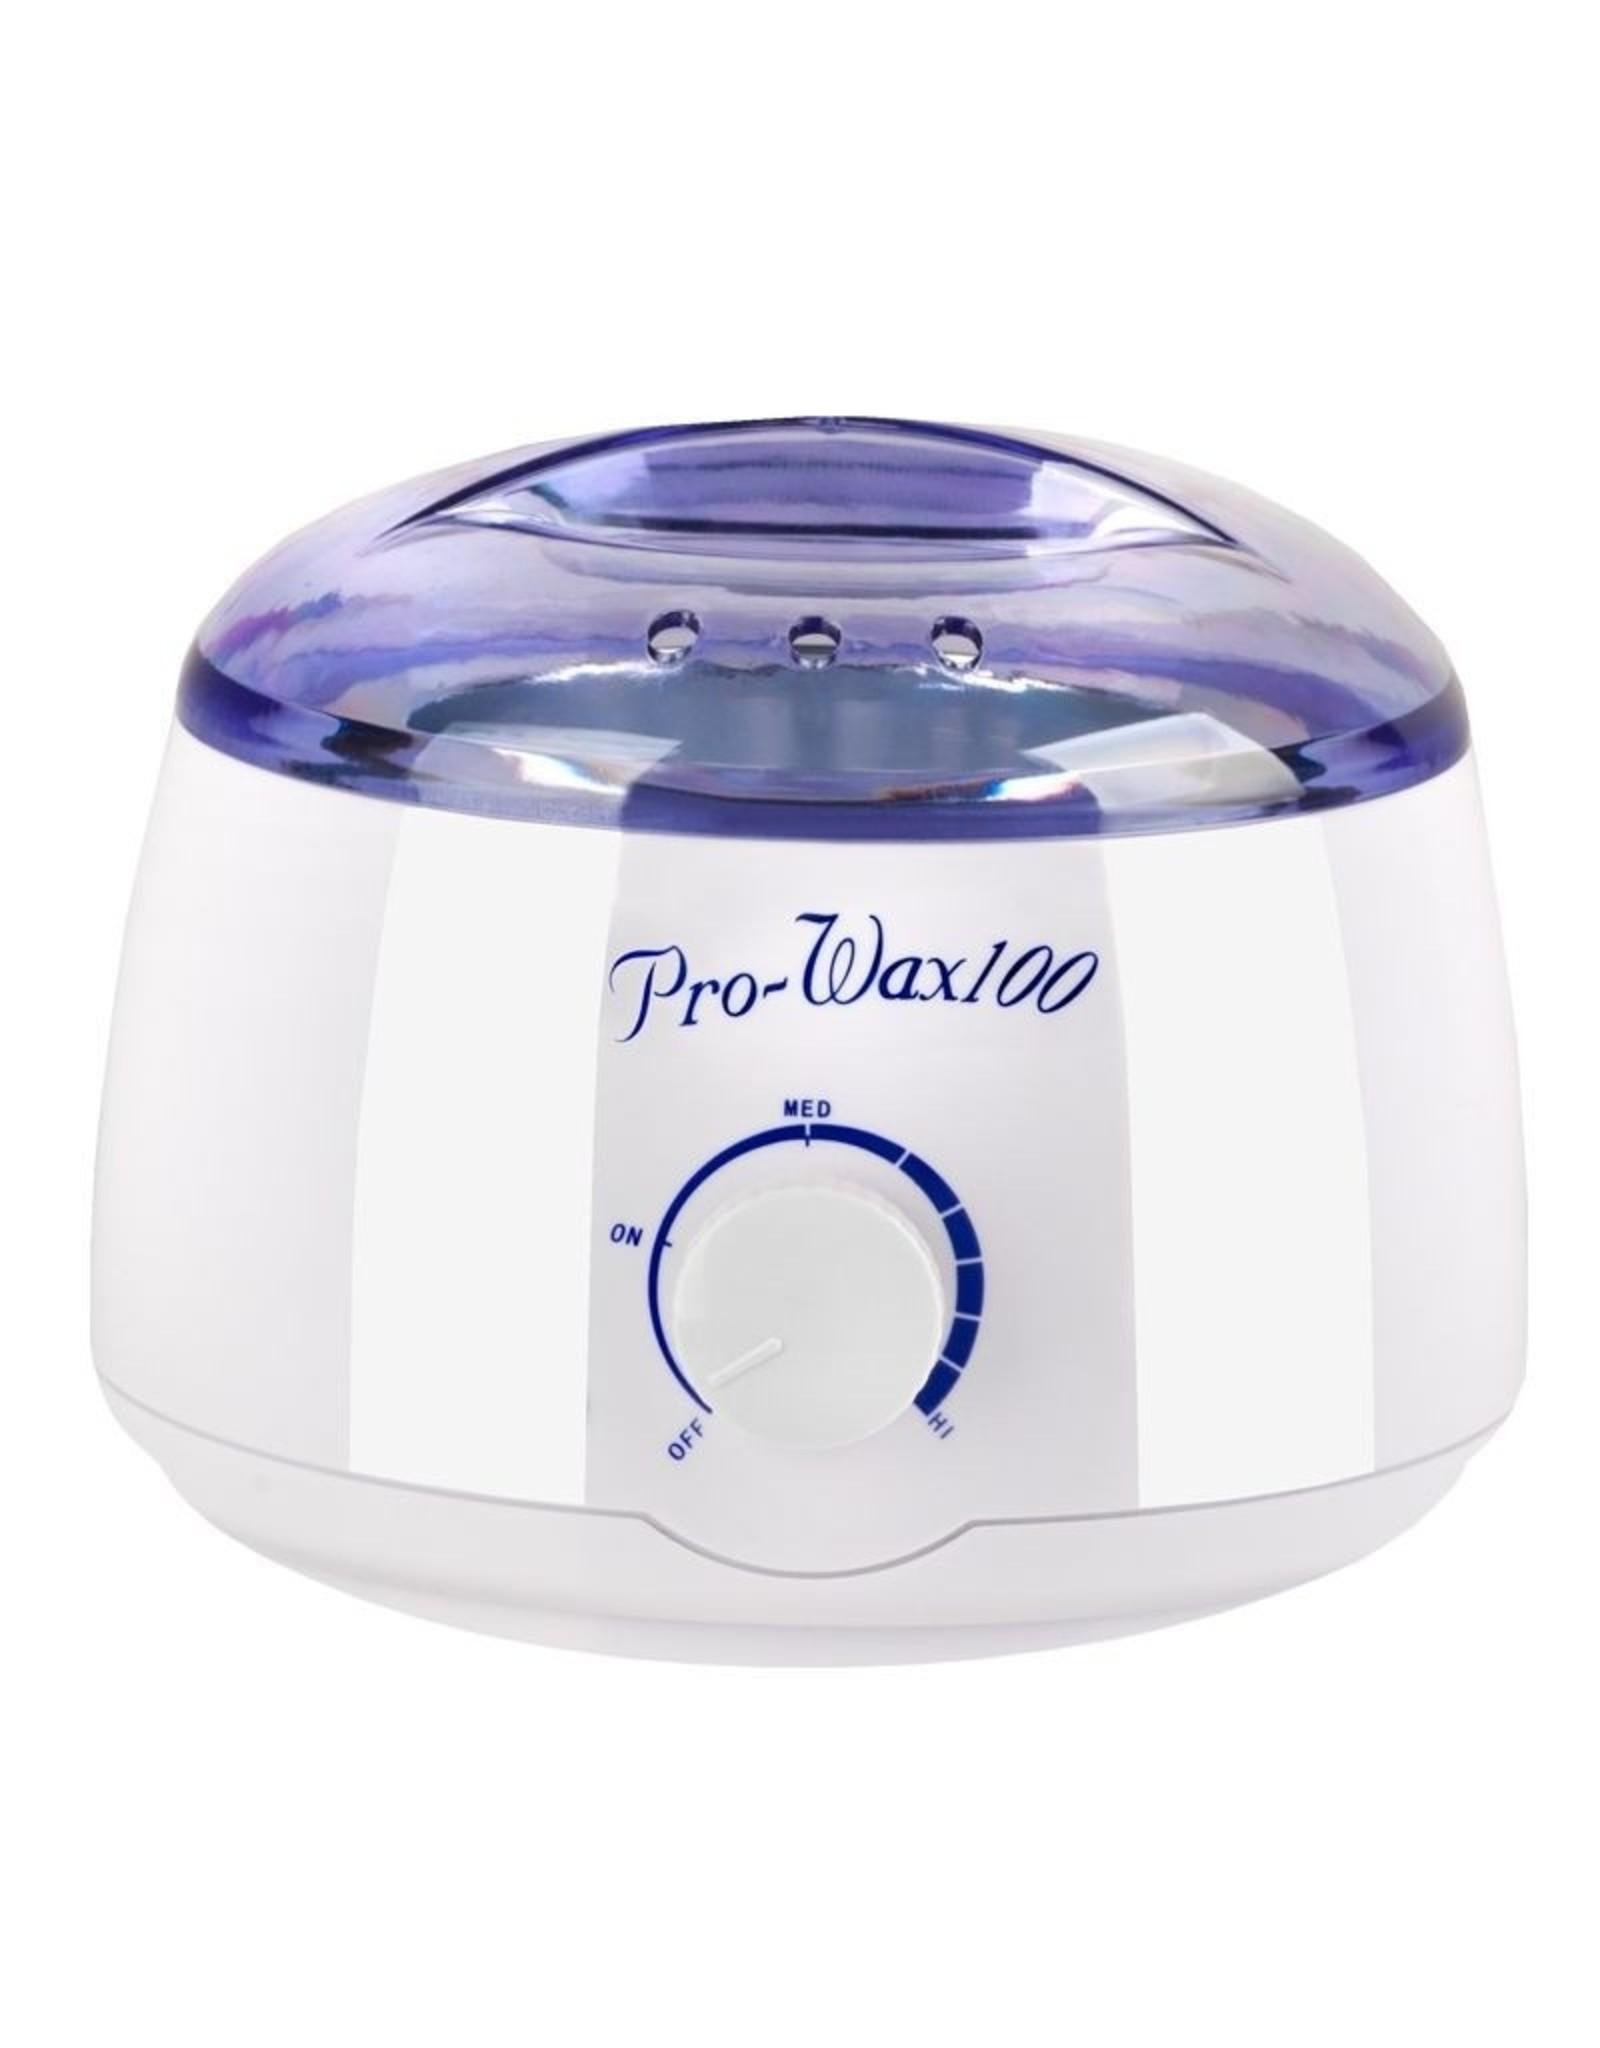 Merkloos WAX/HARS Verwarmer 400ML, 100W Blauw/Wit